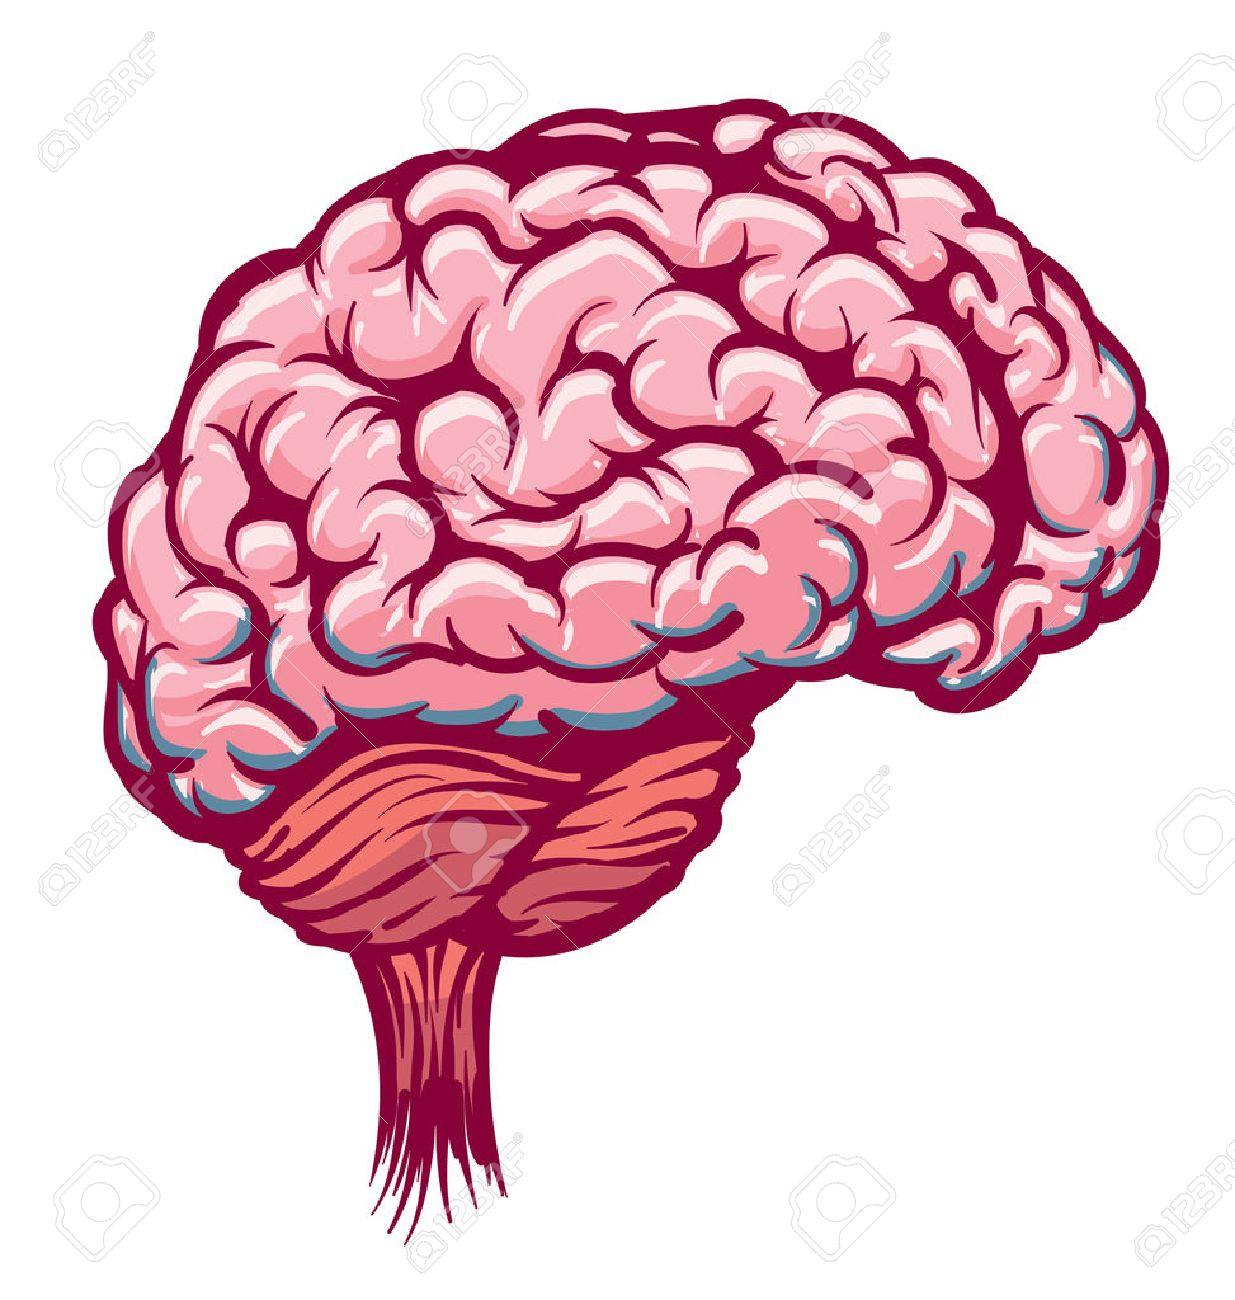 cartoon brain pink red royalty free cliparts vectors and stock rh 123rf com Brain Clip Art heart and brain cartoon images